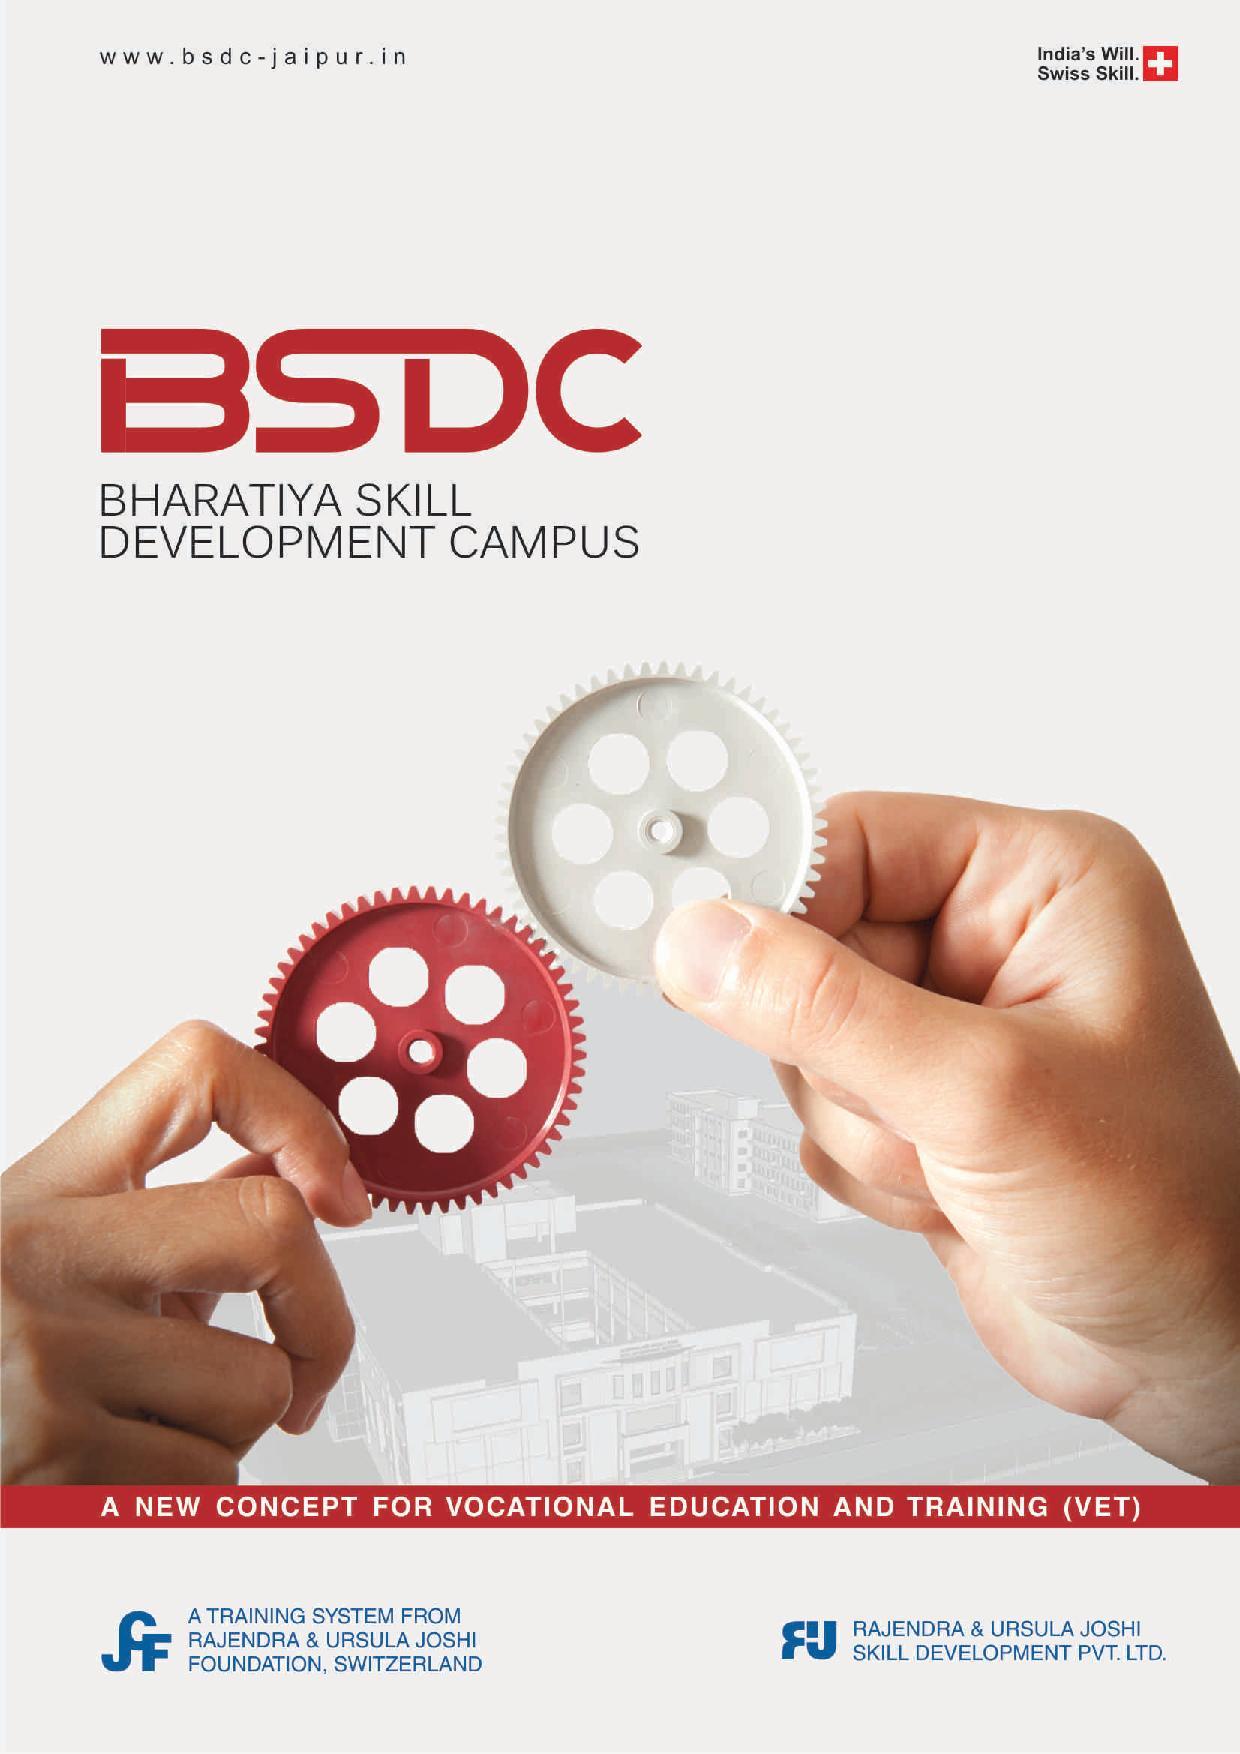 BSDC Bharatiya Skill Development Campus